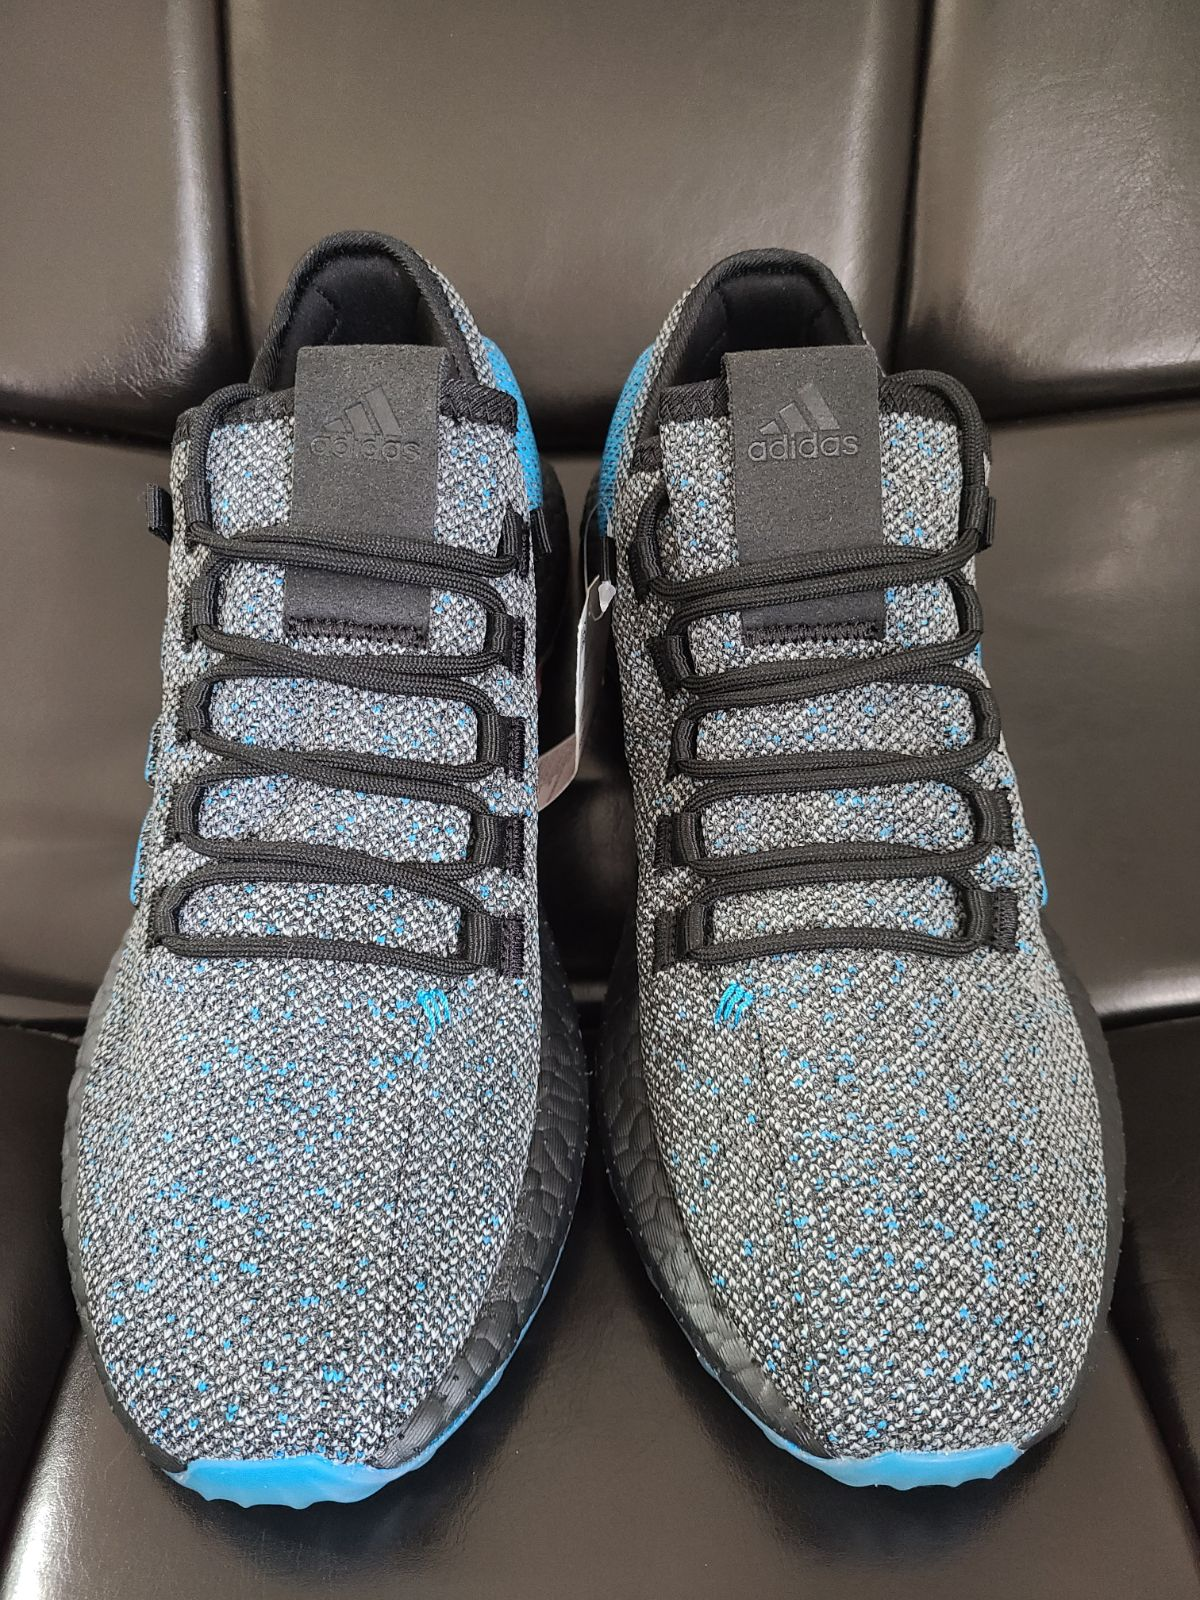 Adidas Pureboost LTD Shoes